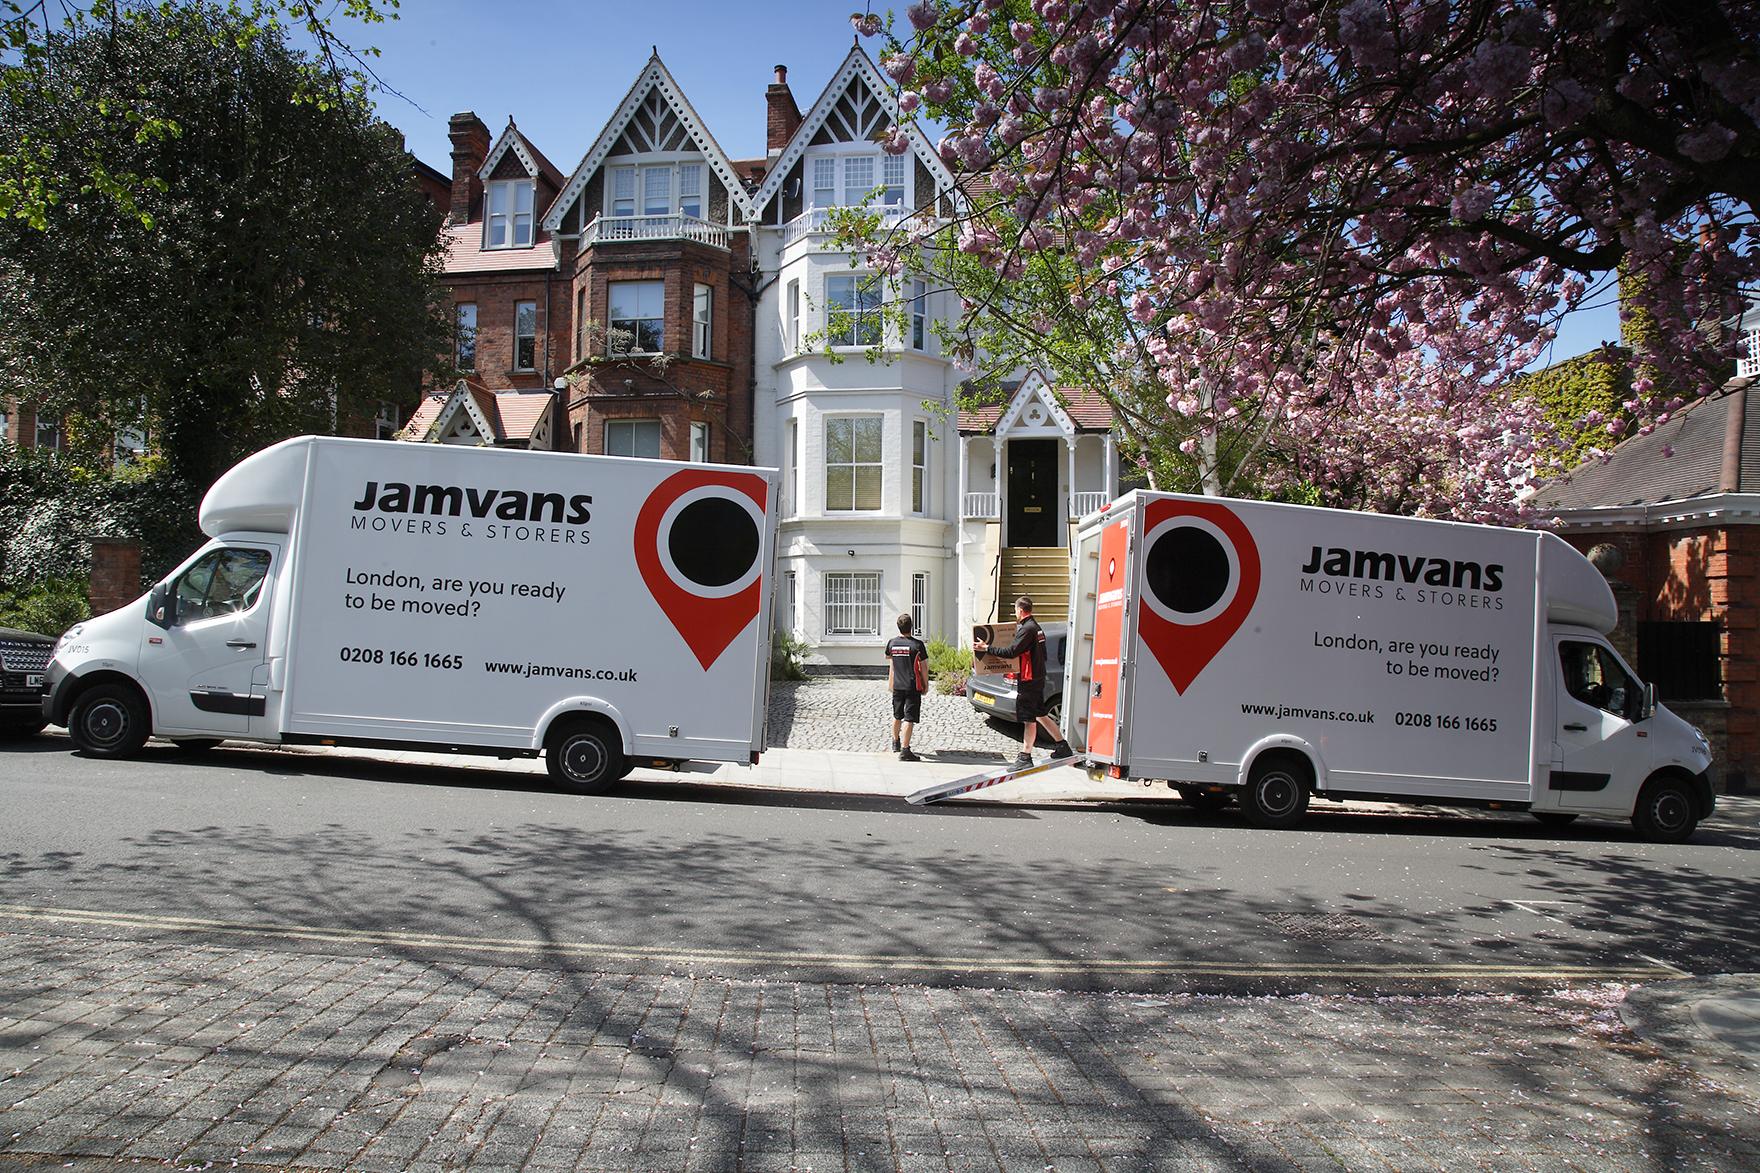 Downsizing your London property